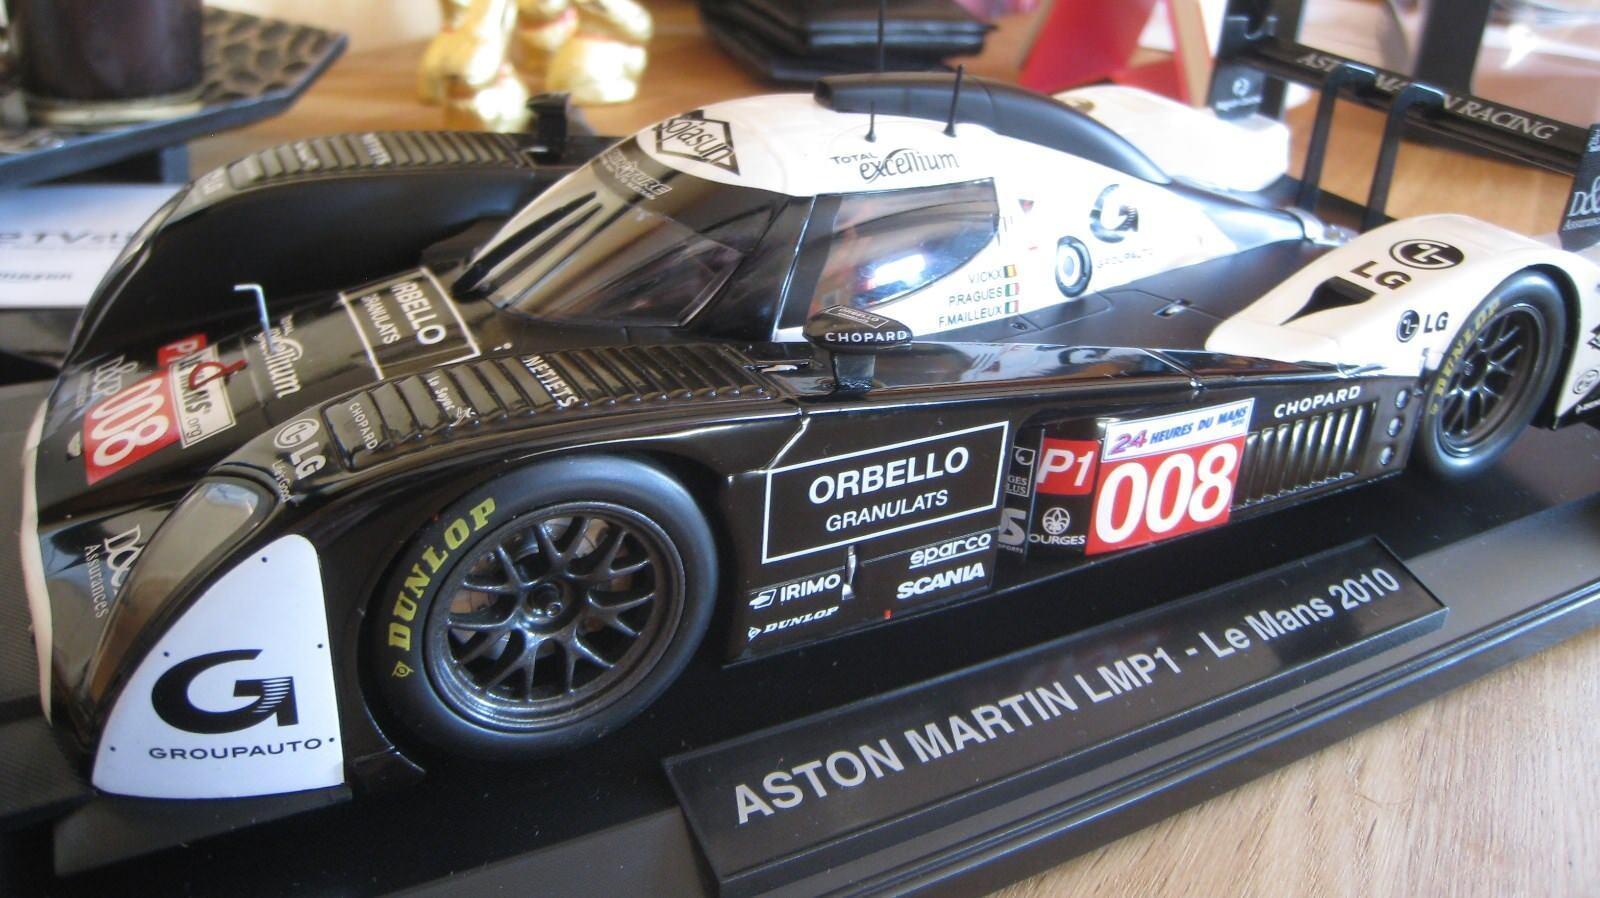 Aston Martin lmp1 le mans 2010 1 18 OVP nr 008